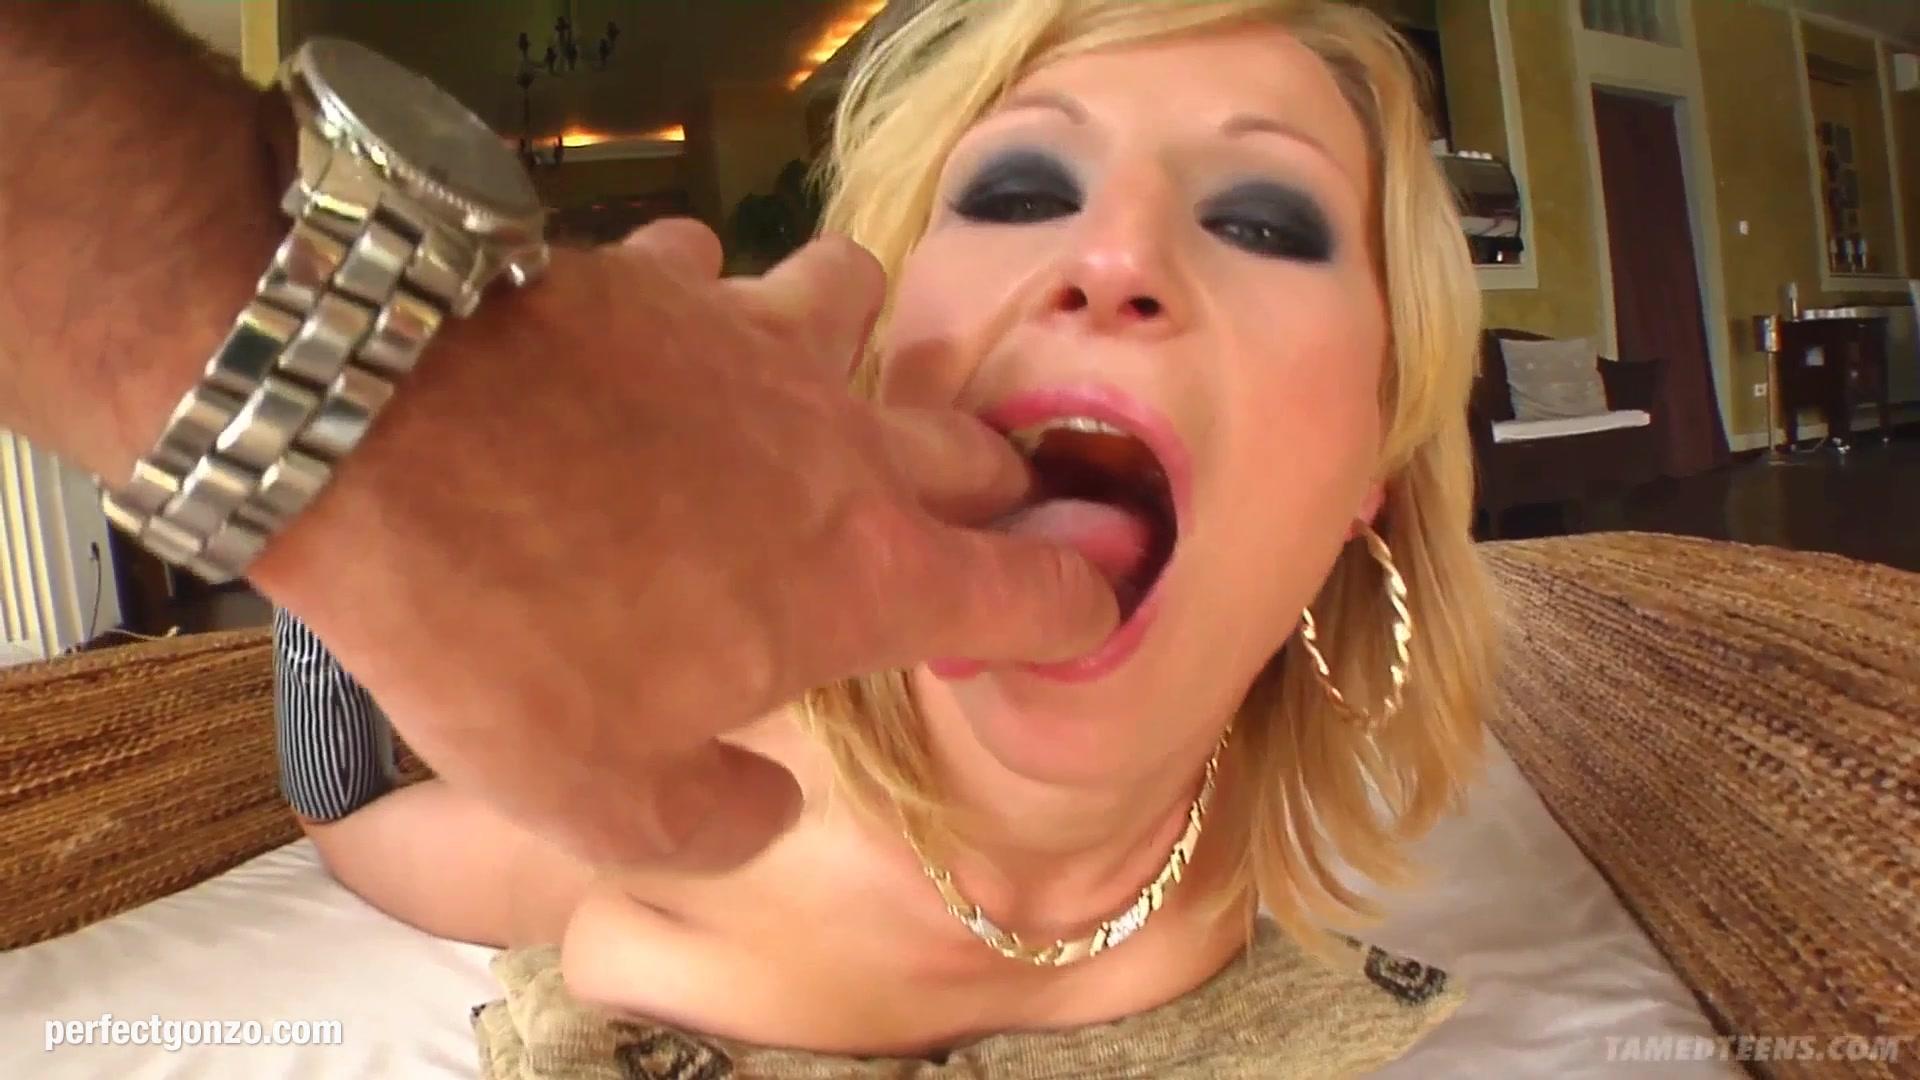 Marian porn video something